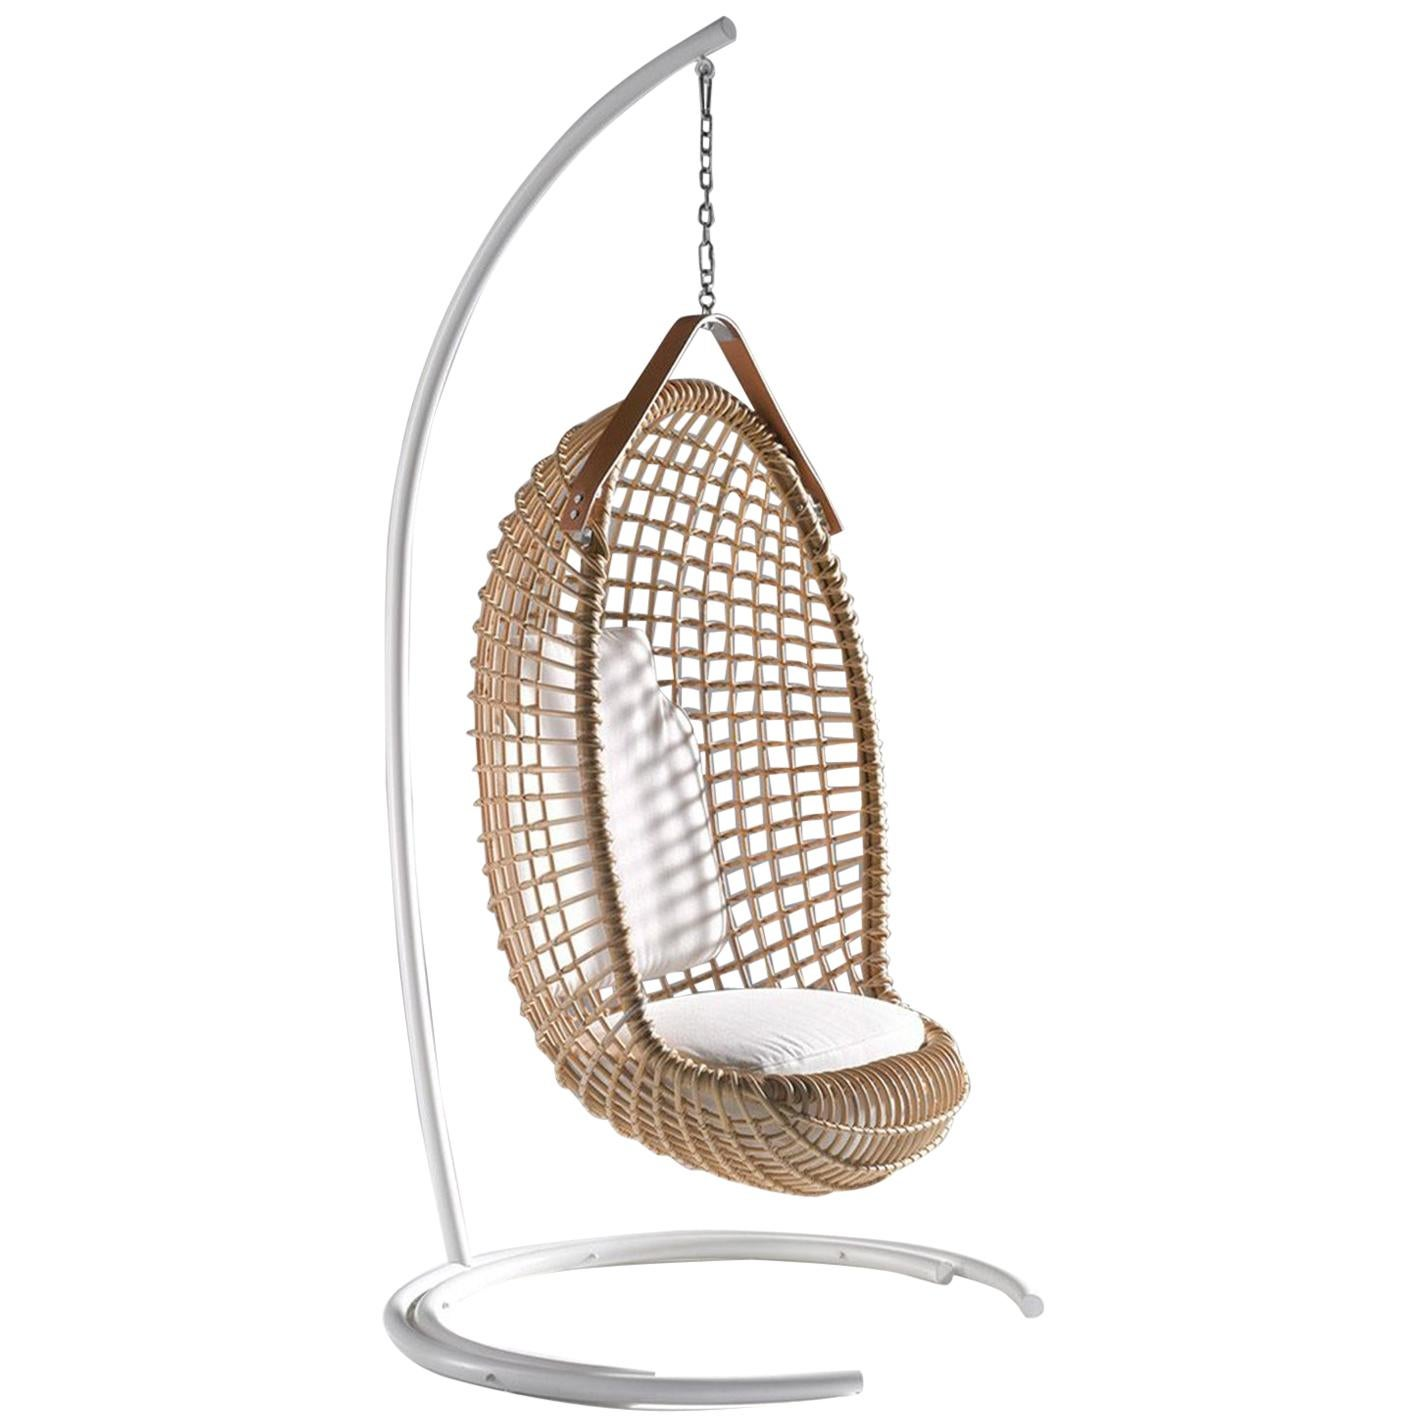 Bonacina 1889 Stand for Eureka Rattan Indoor Hanging Chair, Giovanni Travasa